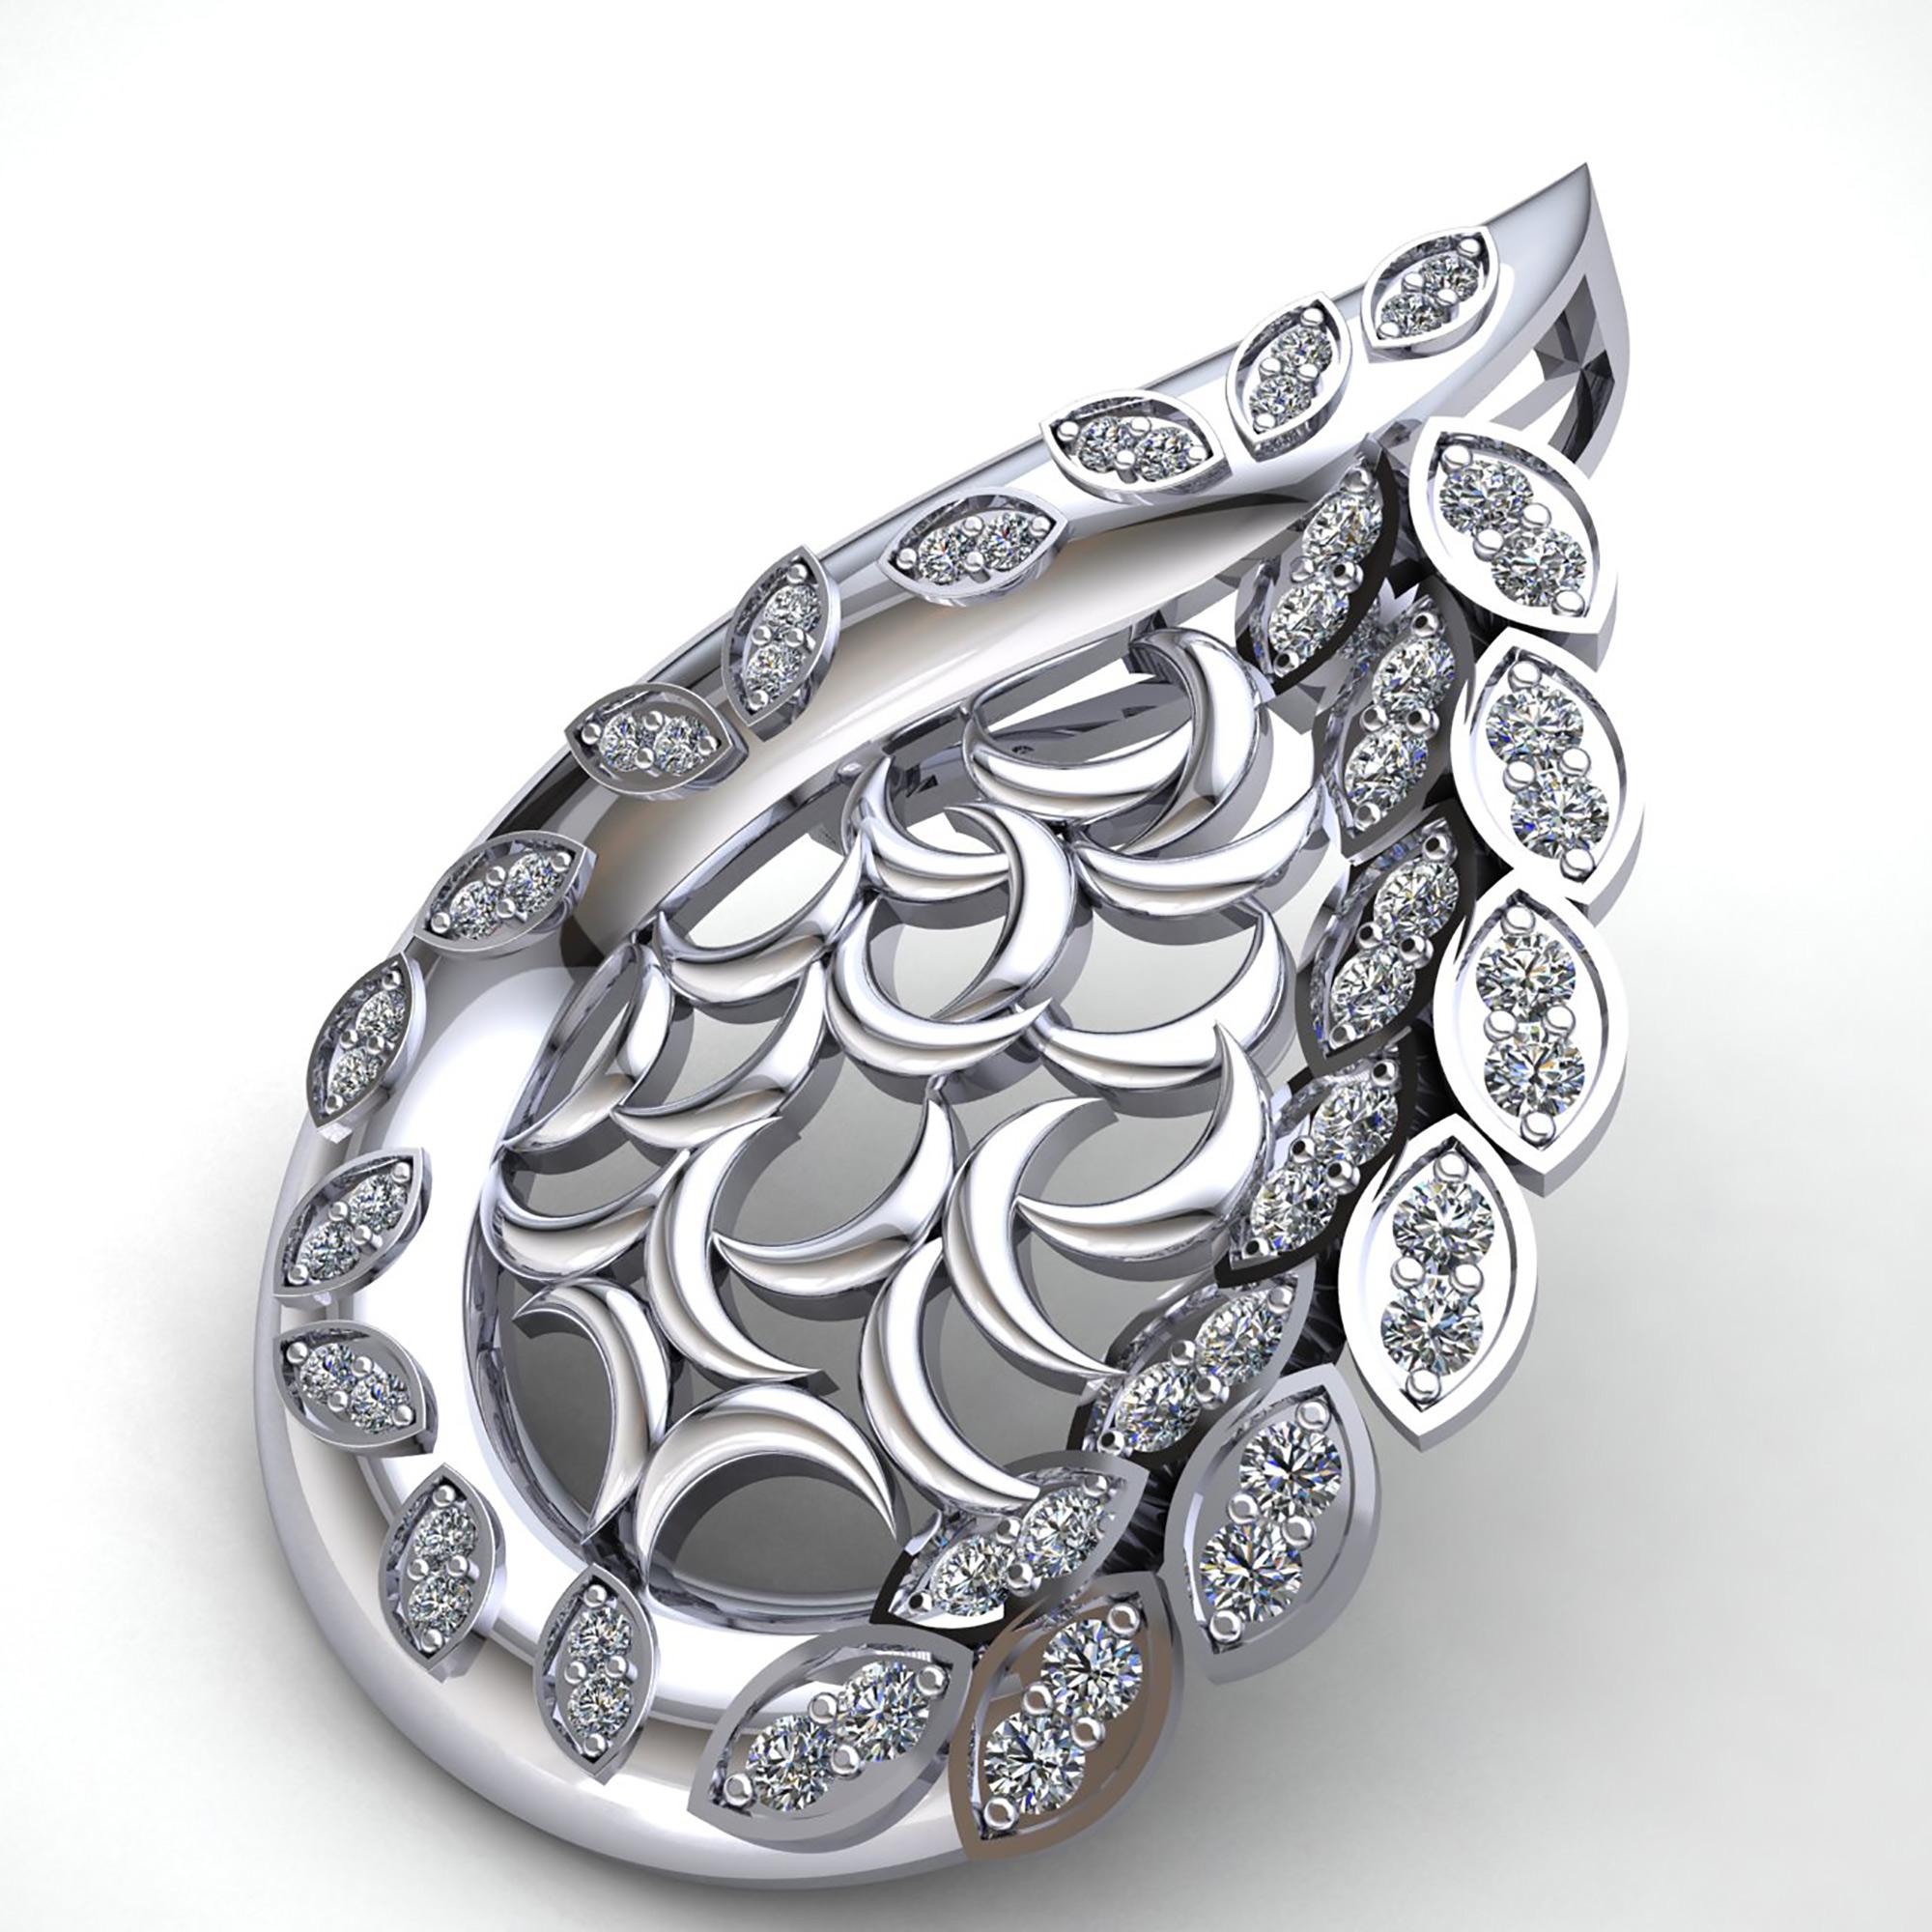 0-75carat-Round-Cut-Diamond-Ladies-Fashion-Pendant-14K-Gold thumbnail 10